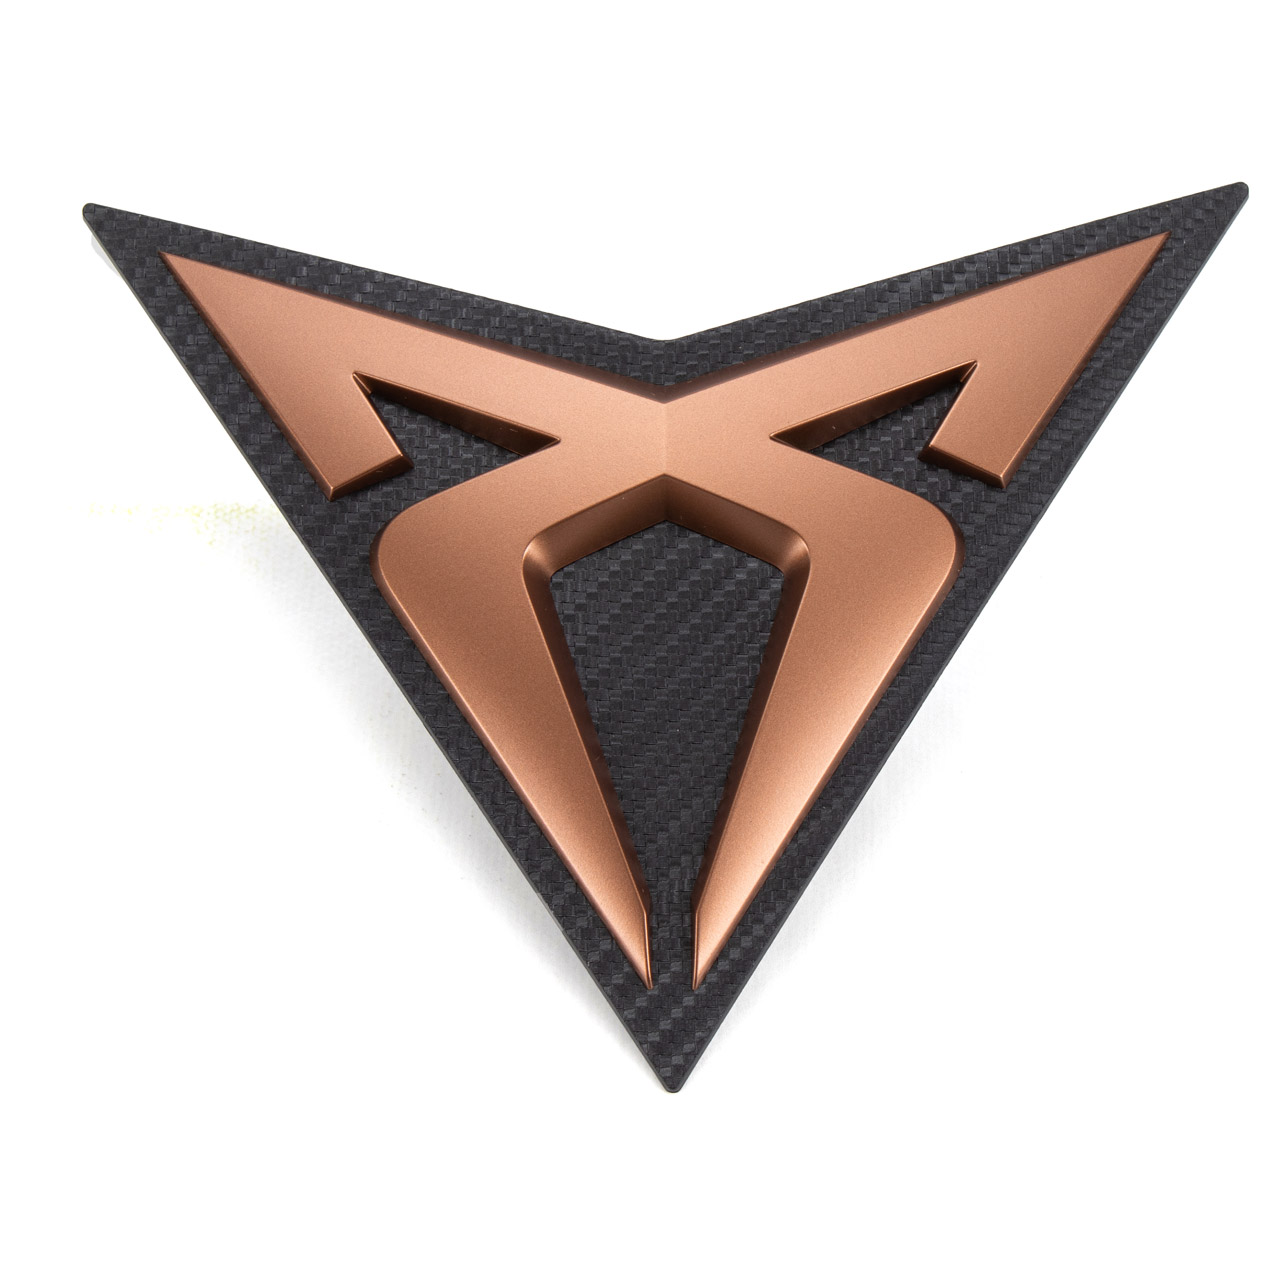 ORIGINAL SEAT CUPRA Kupfer Emblem Logo Plakette Kühlergrill Formentor 5FF853679RZH